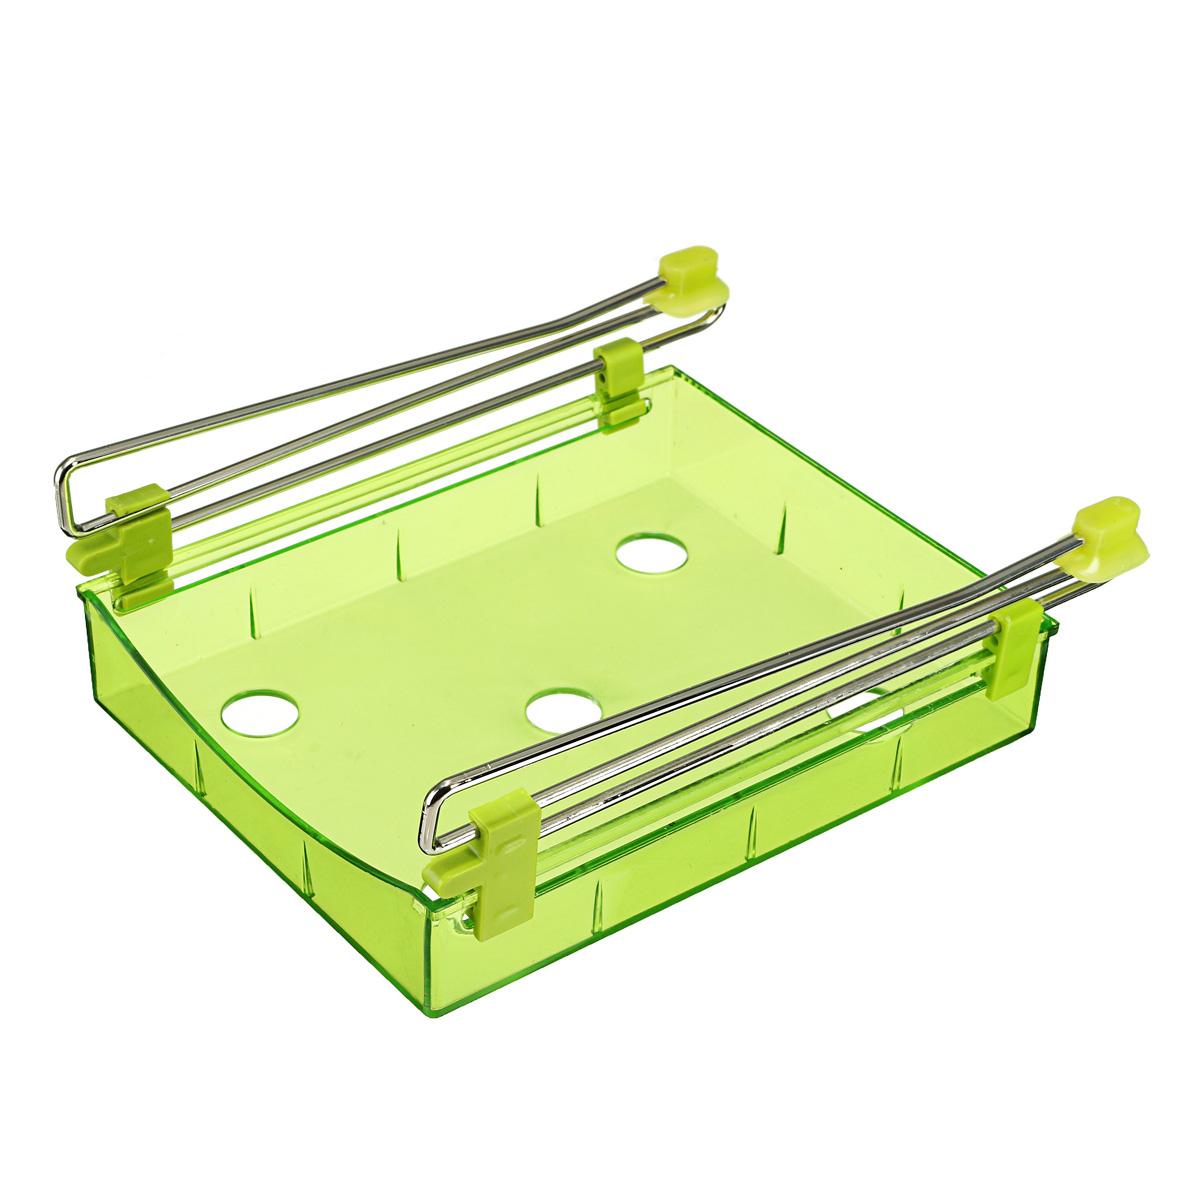 nettoyeur multi usages stockage tiroir coulissant pr r frig rateur organisateur. Black Bedroom Furniture Sets. Home Design Ideas